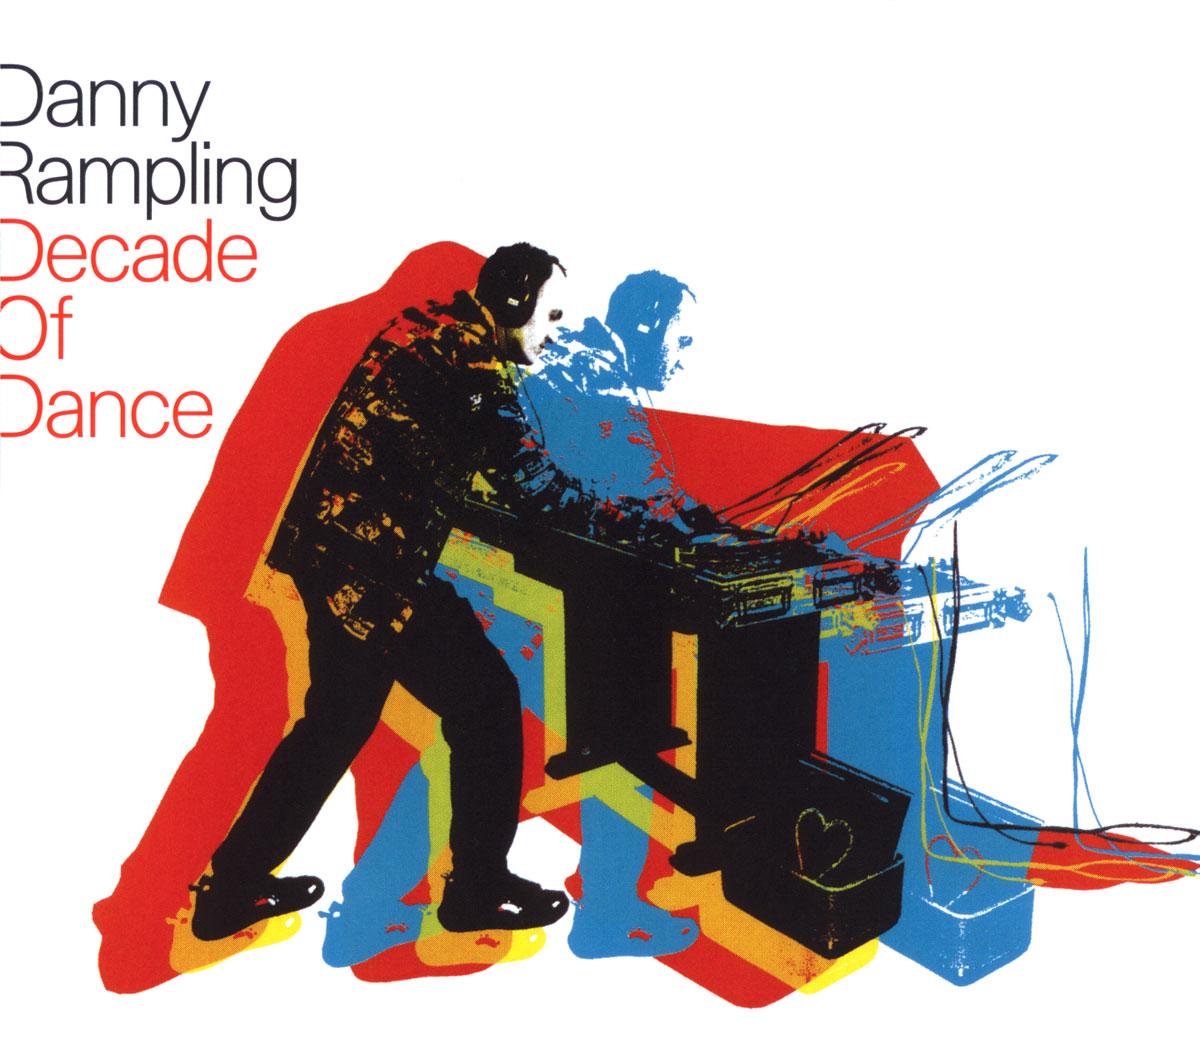 Studio Oscar - DANNY RAMPLING